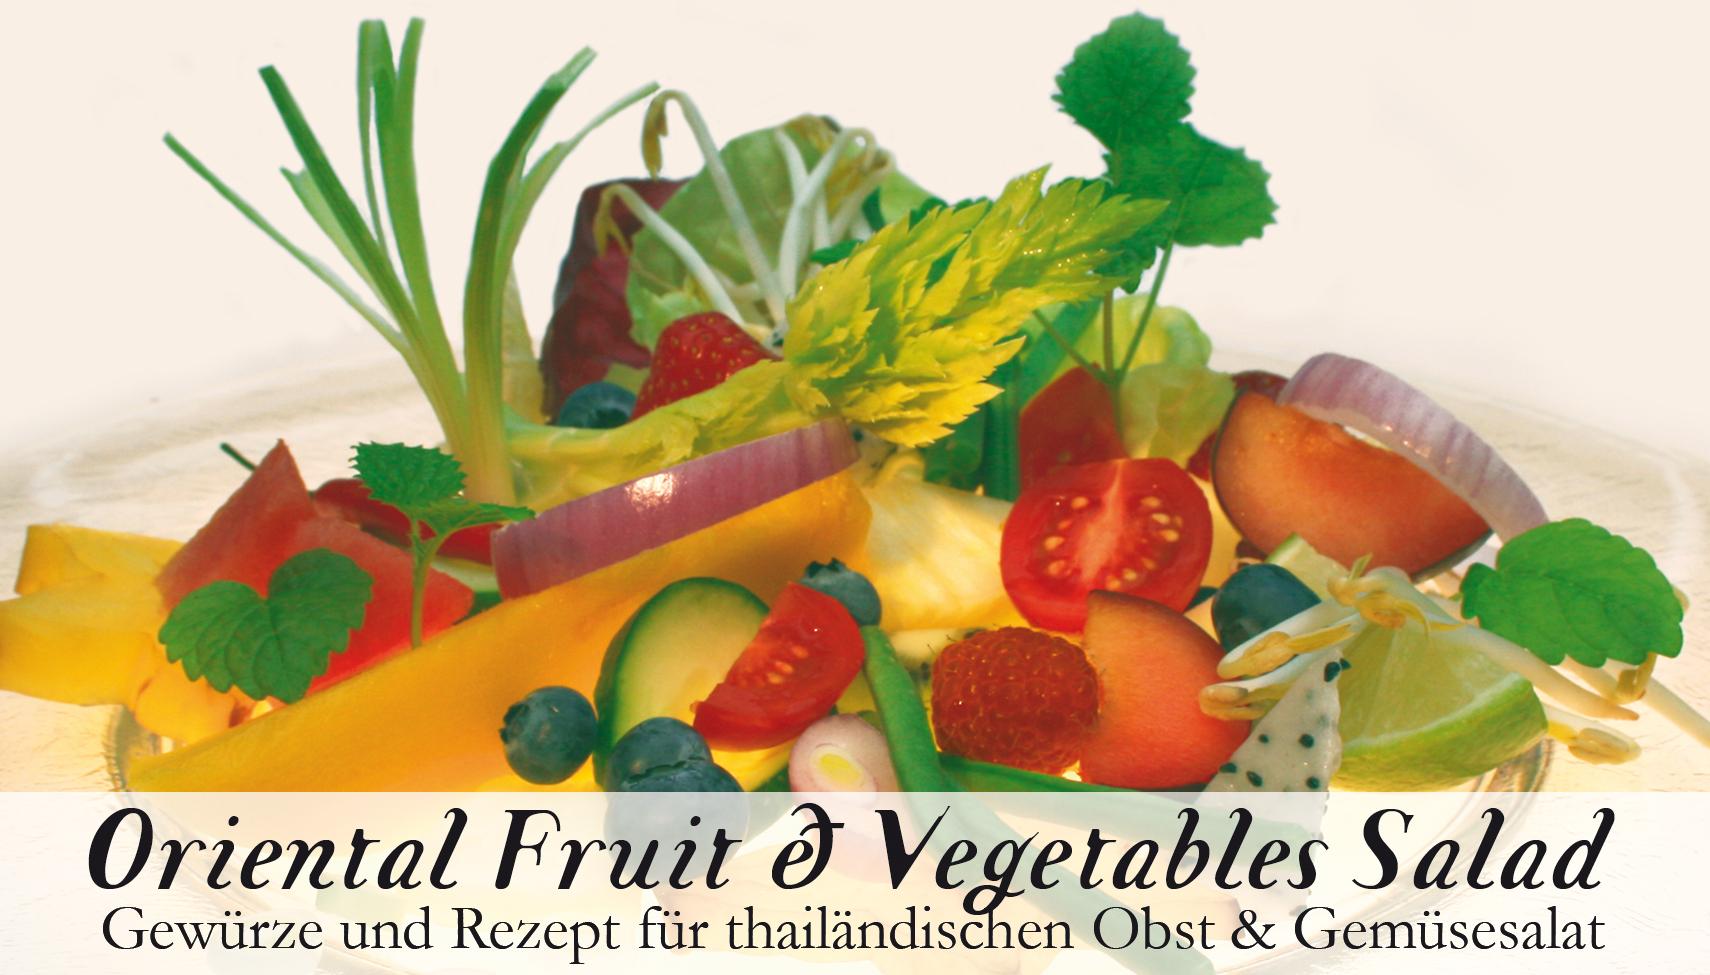 Oriental Fruit & Vegetable Salad